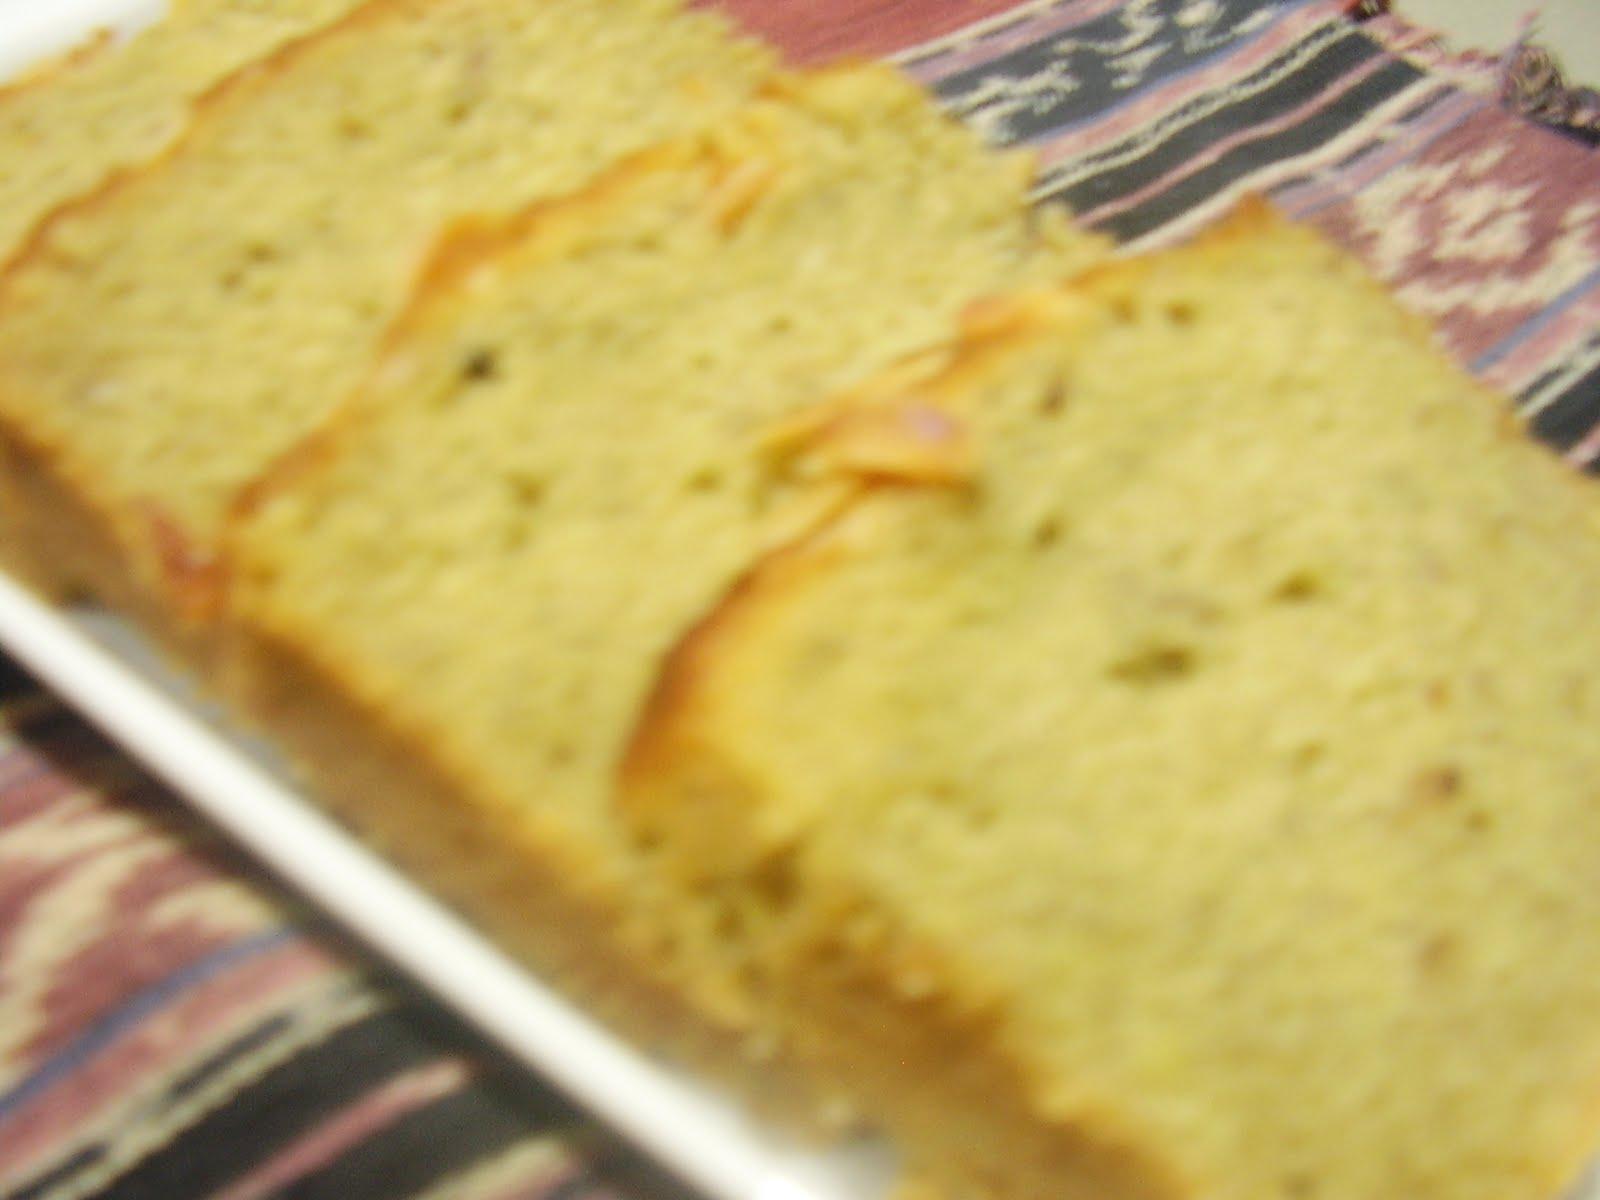 Resep Banana Cake Khas Jepang: CAKE PISANG/BANANA CAKE